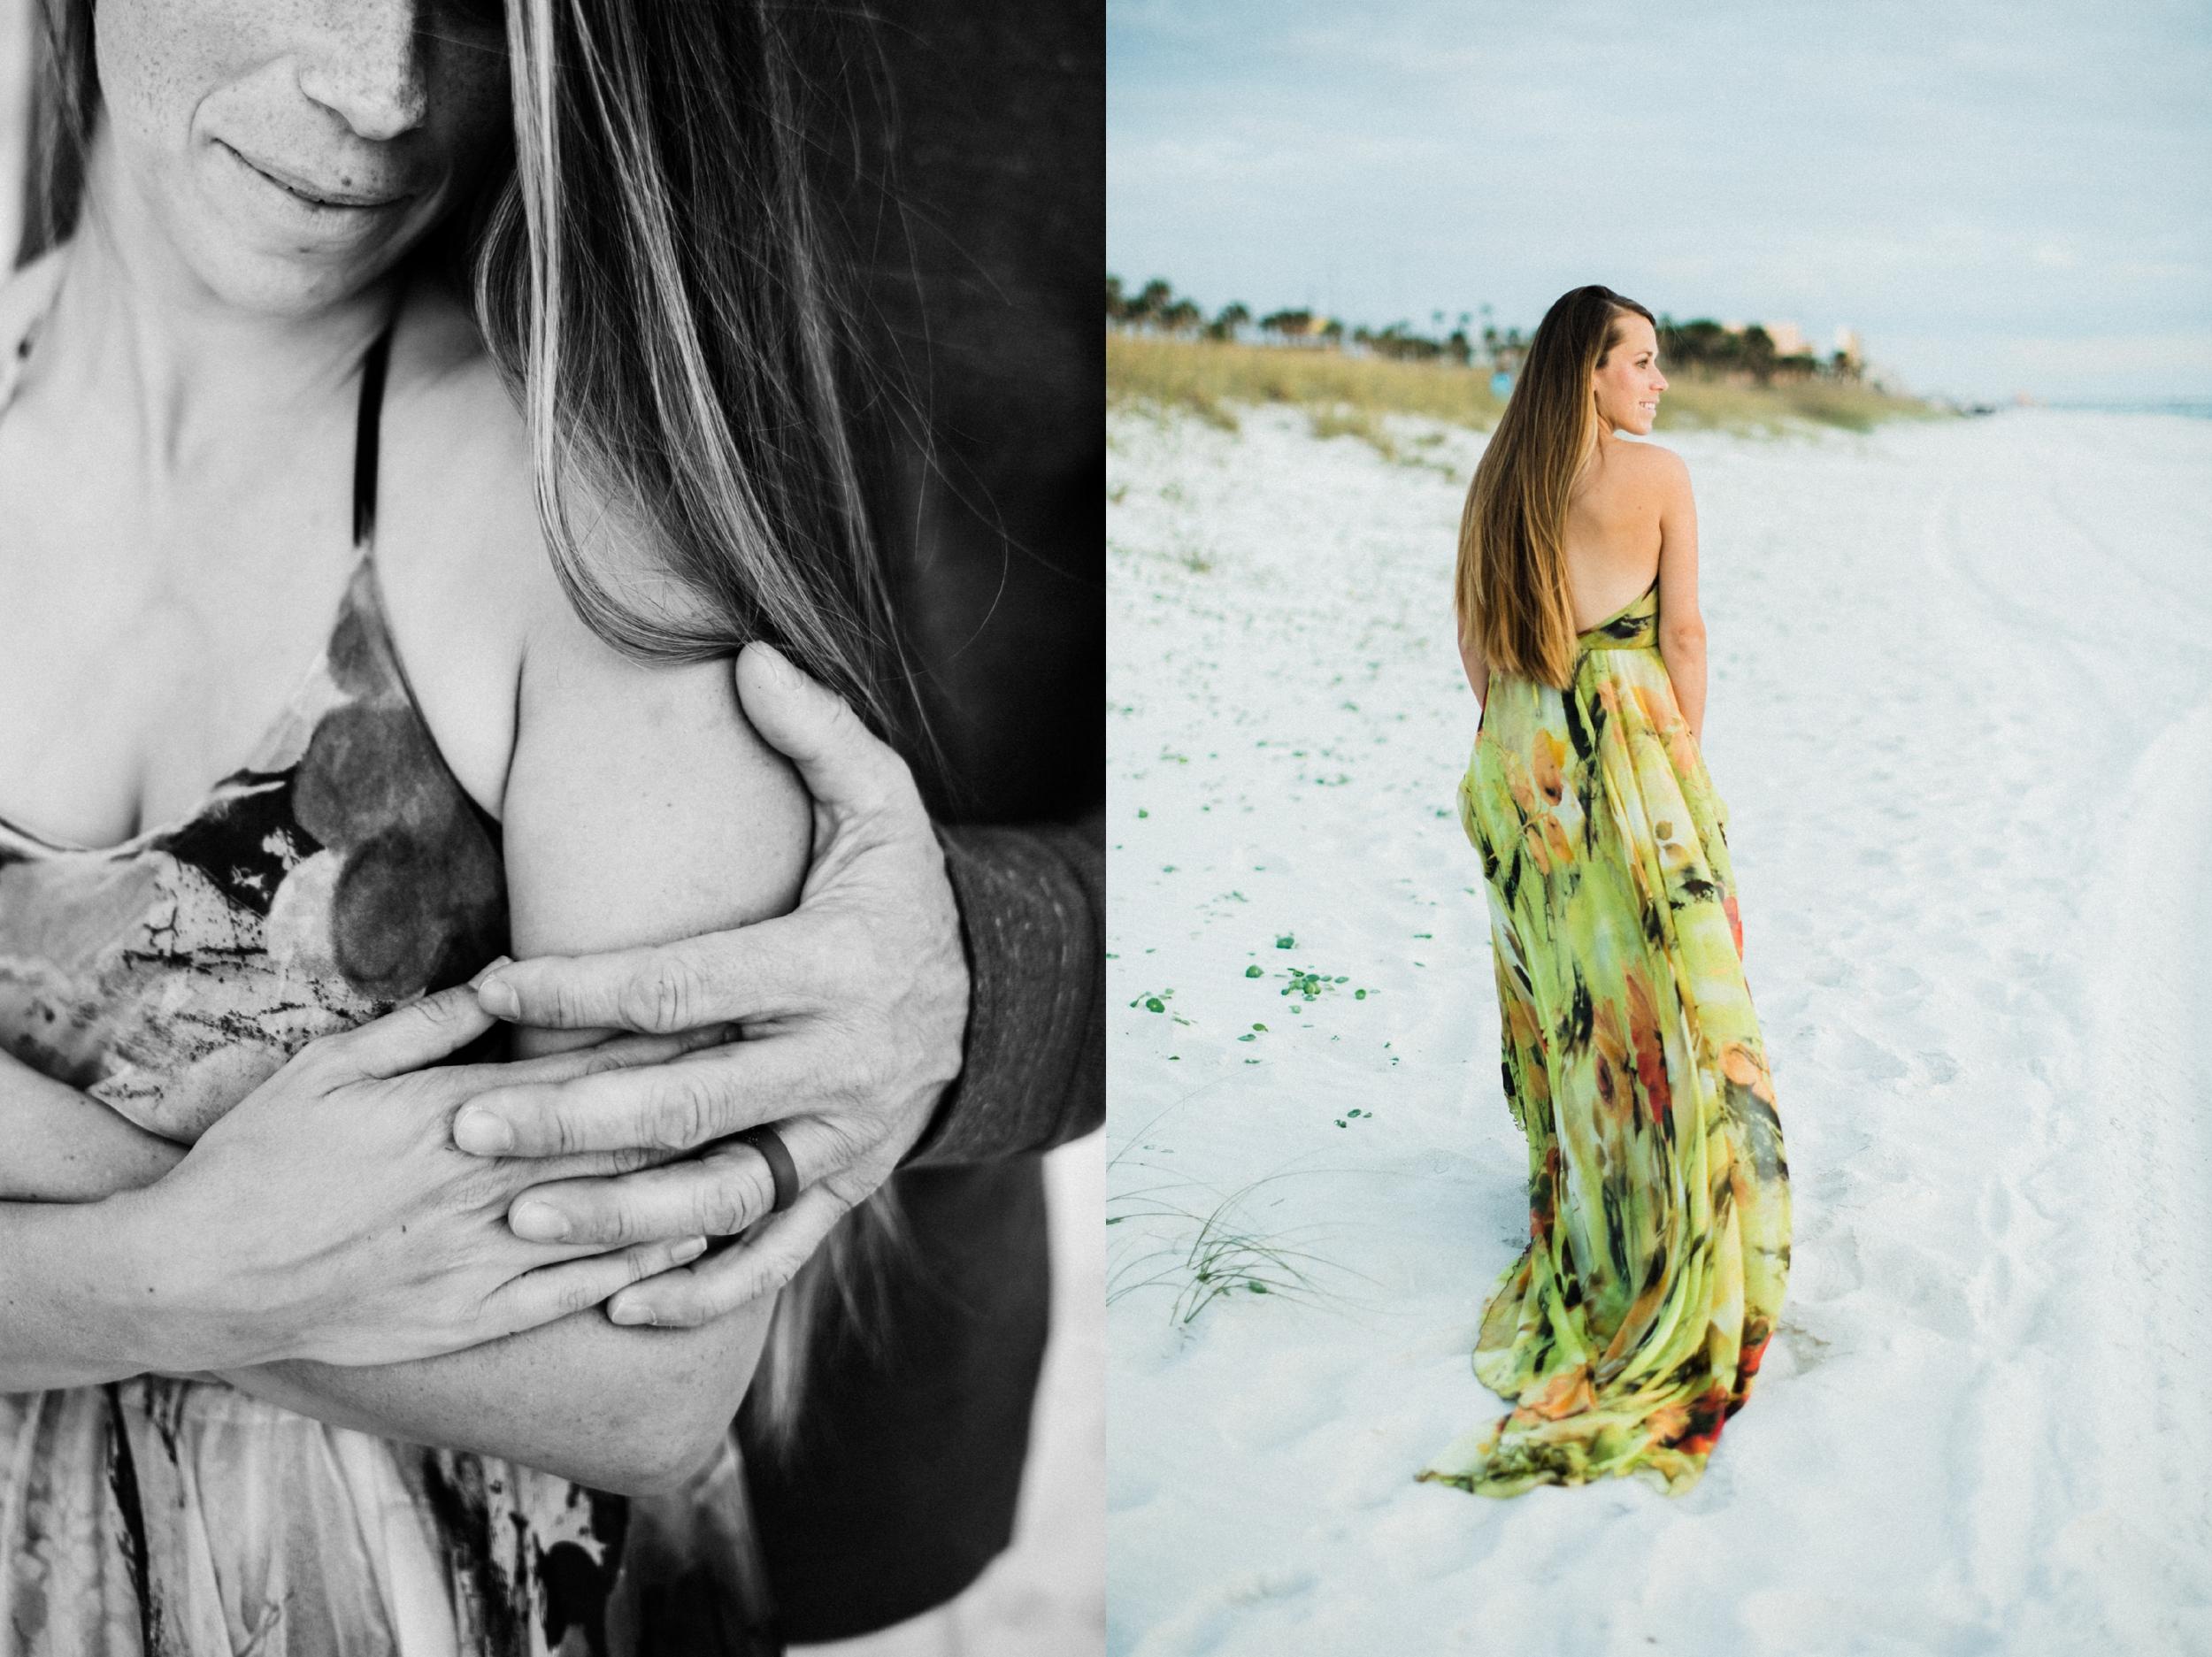 desiree-gardner-photography-pairs-france-monet-garden-monets-couple-wedding-engagement-giverny-30-a-30a-florida_0071.jpg